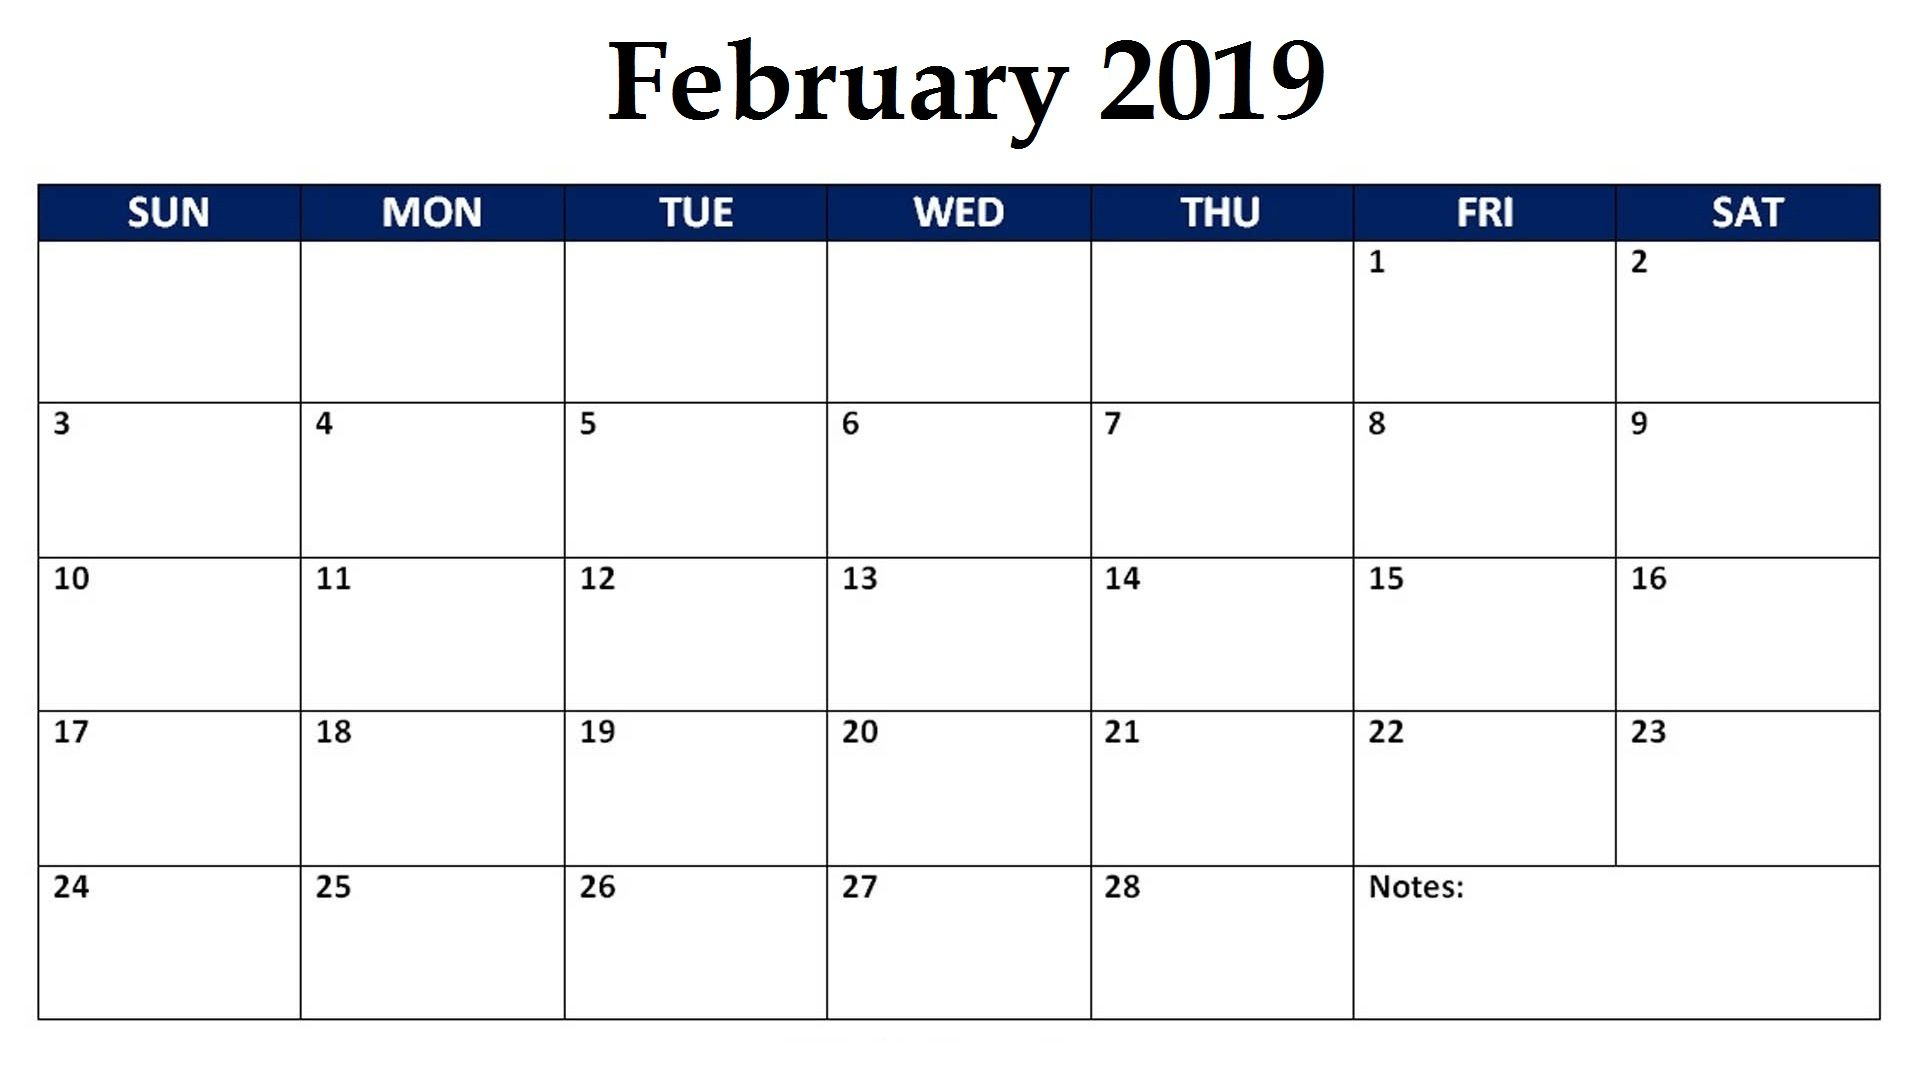 February 2019 Editable Monthly Calendar #feb #feb2019 #holidays with regard to Editable October 2019 Calendar With Religious Holidays